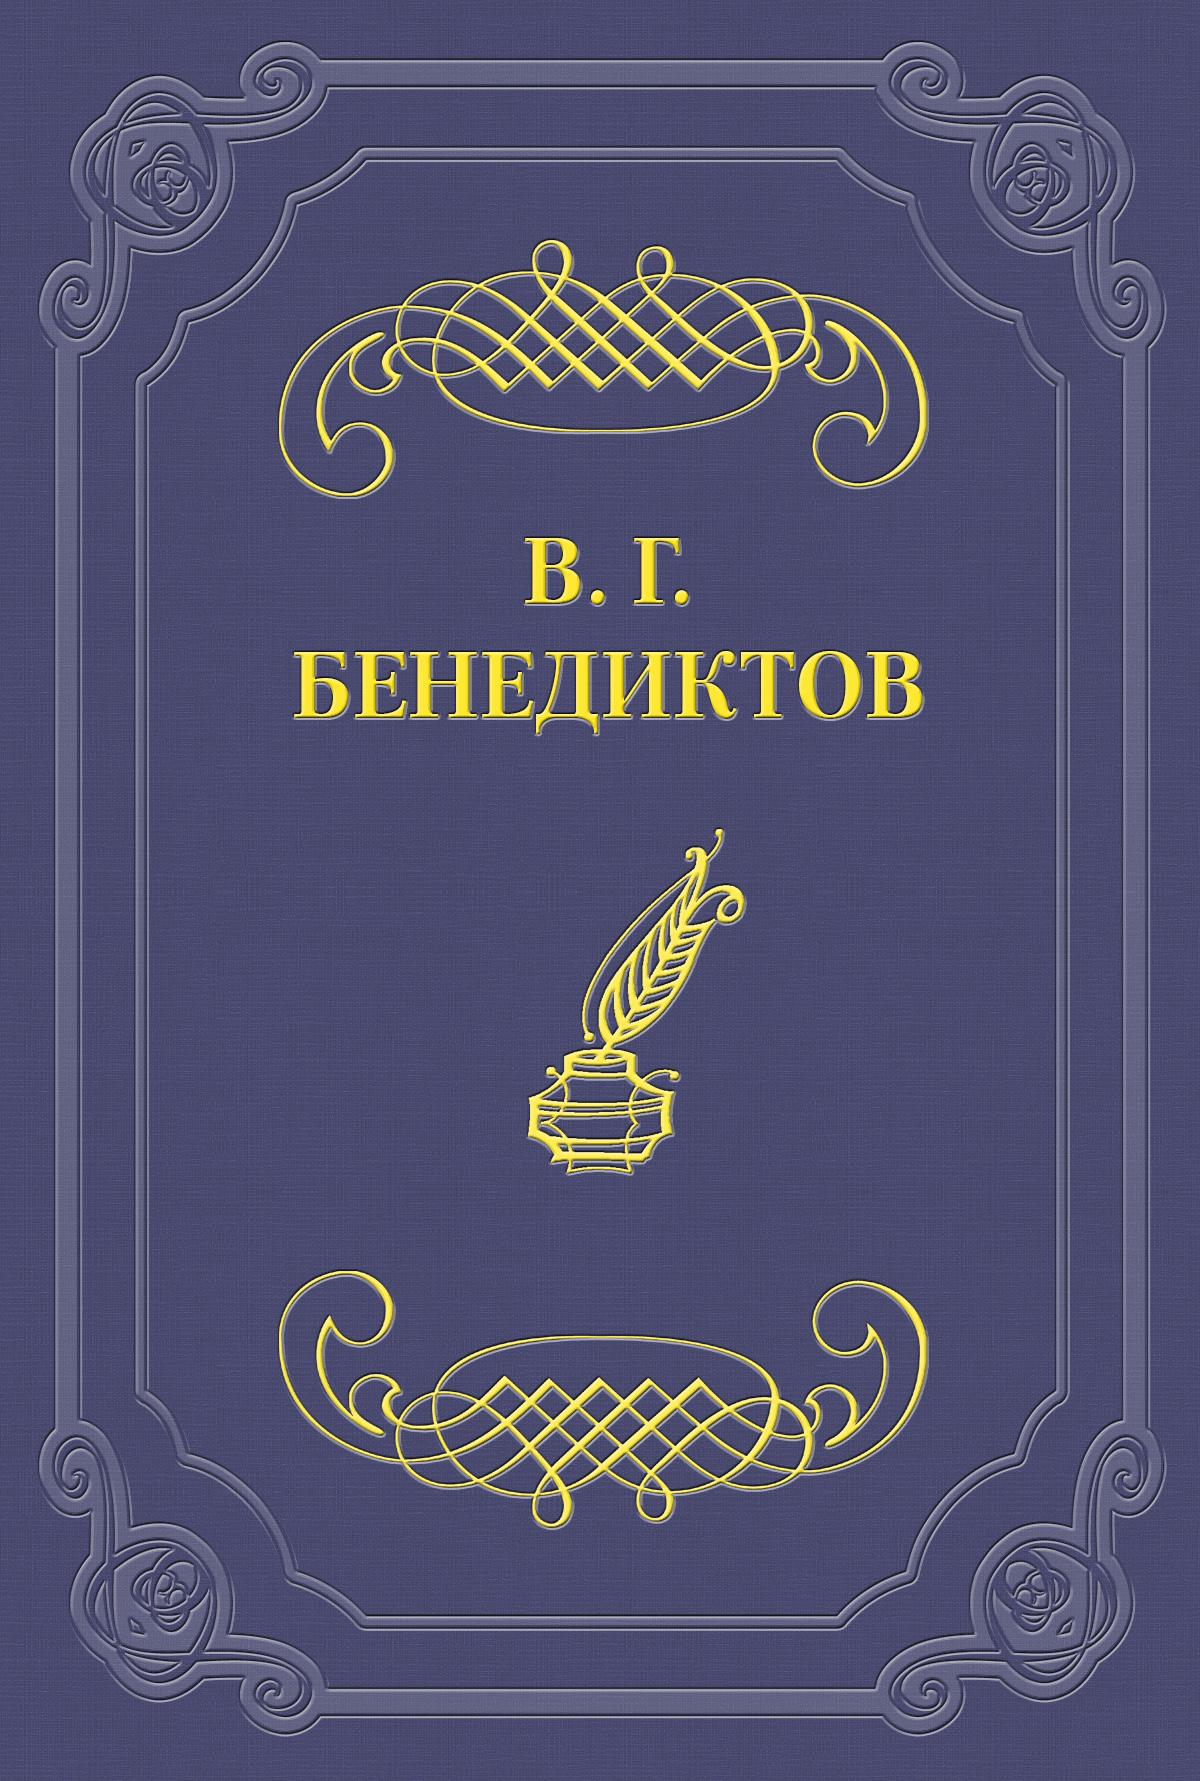 Владимир Бенедиктов Сборник стихотворений 1838 г.